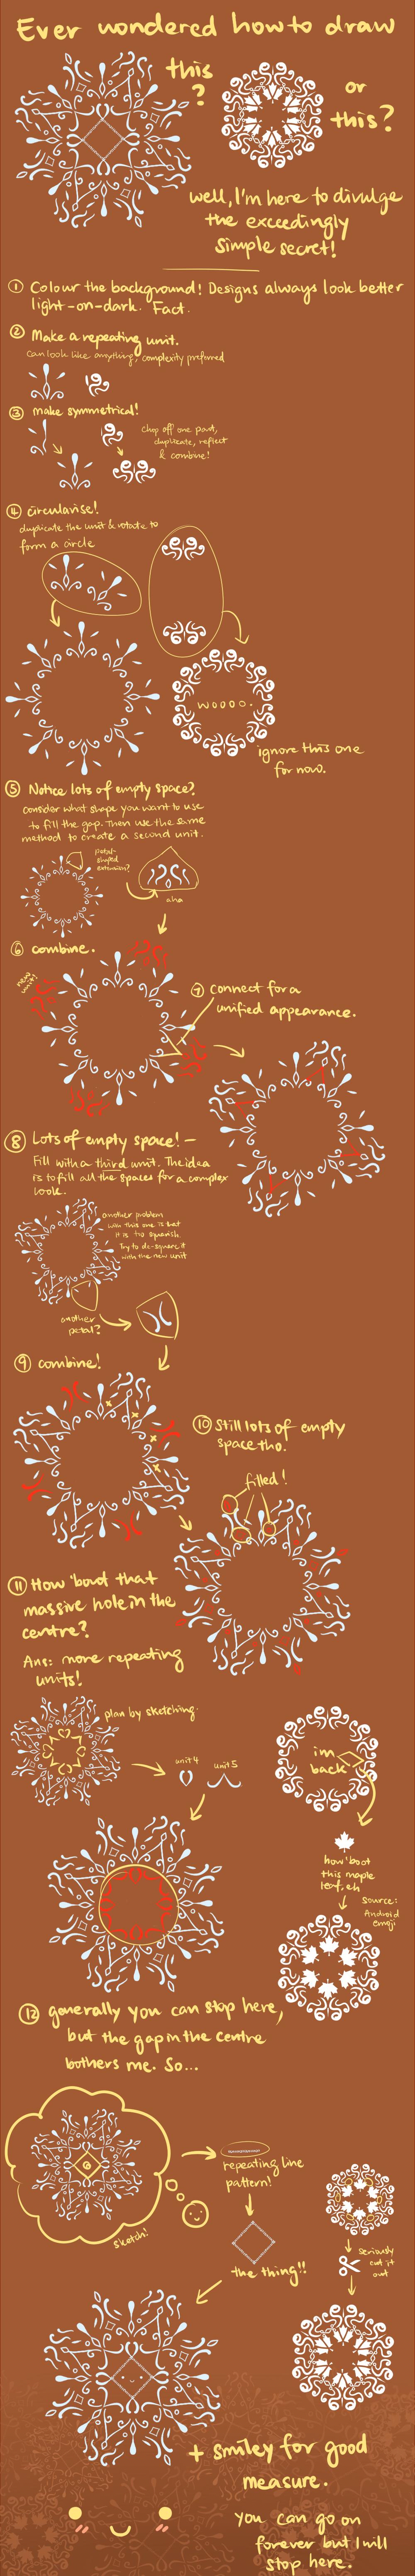 Flowery design tutorial by Sword-Dance